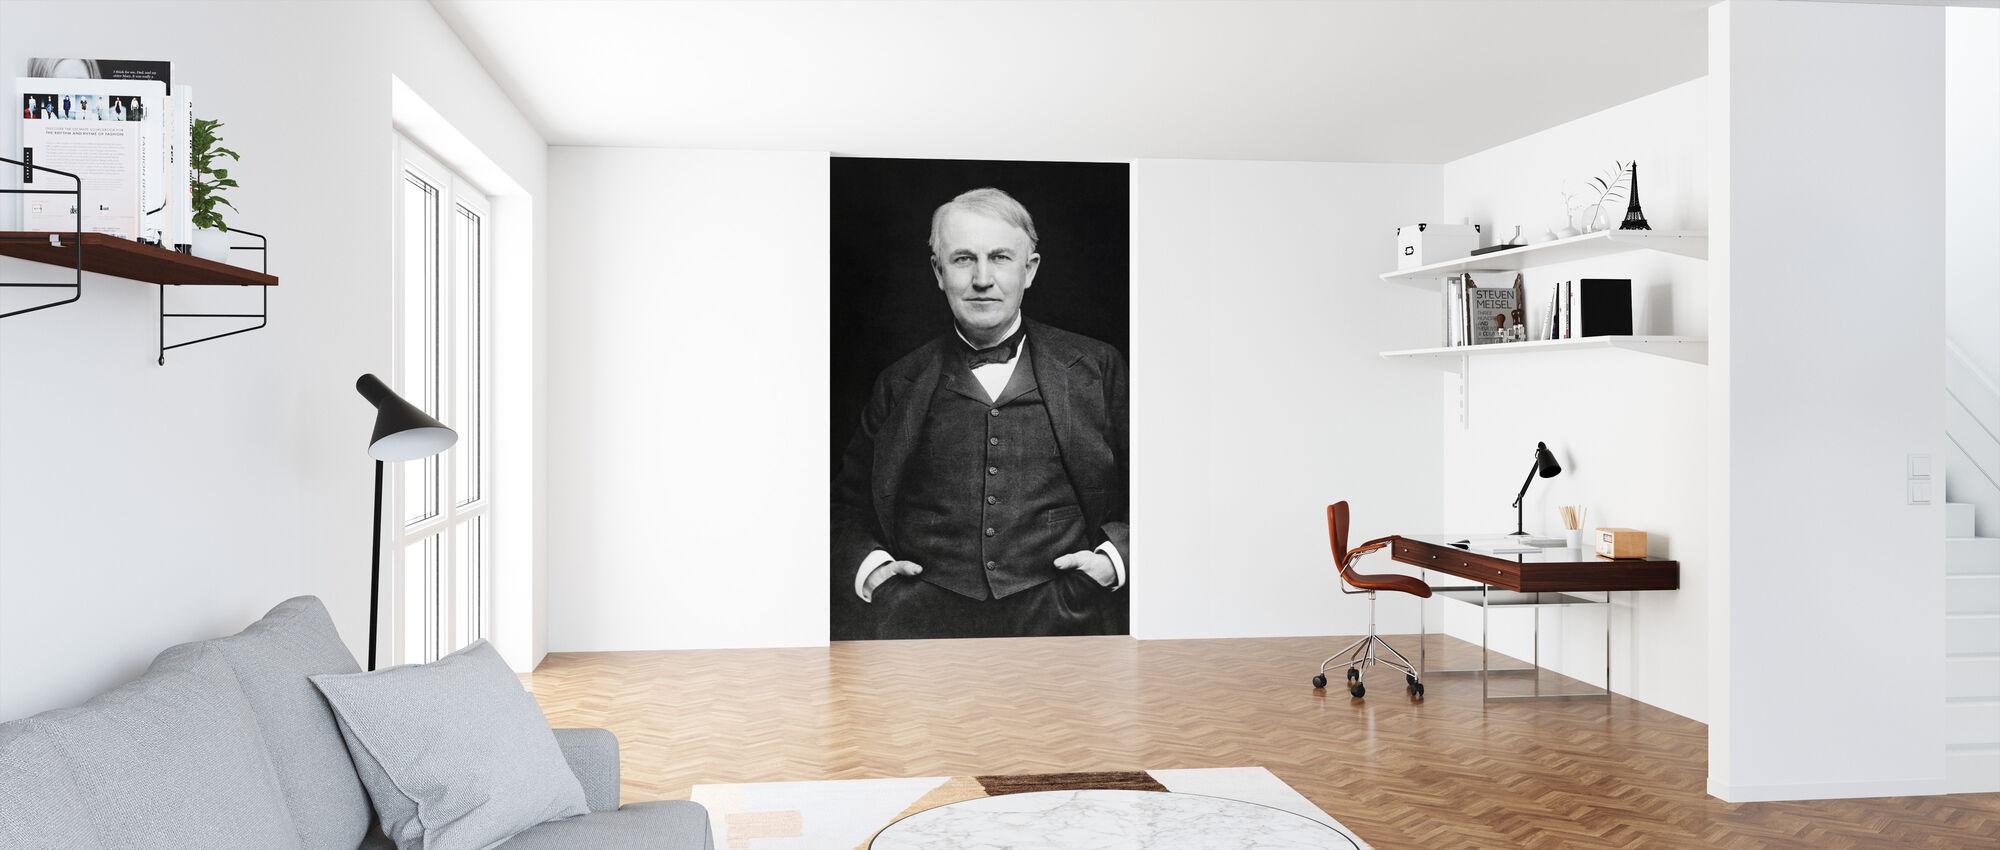 Thomas Edison - Wallpaper - Office